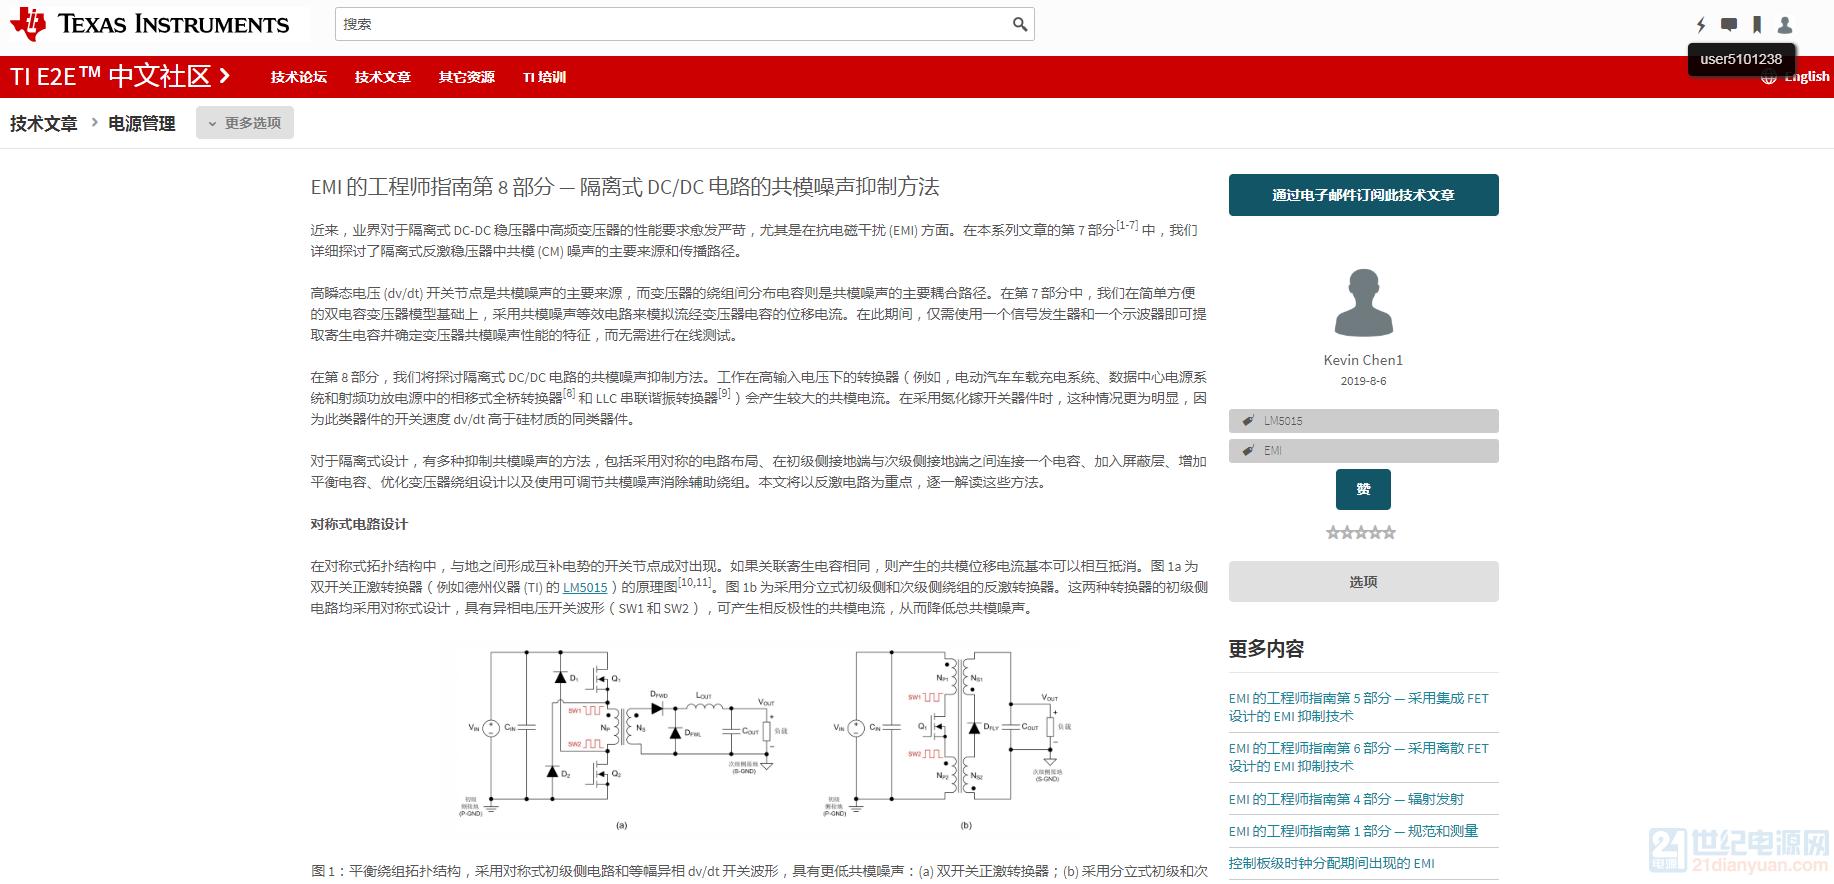 TI技术文章EMI工程师指南.png